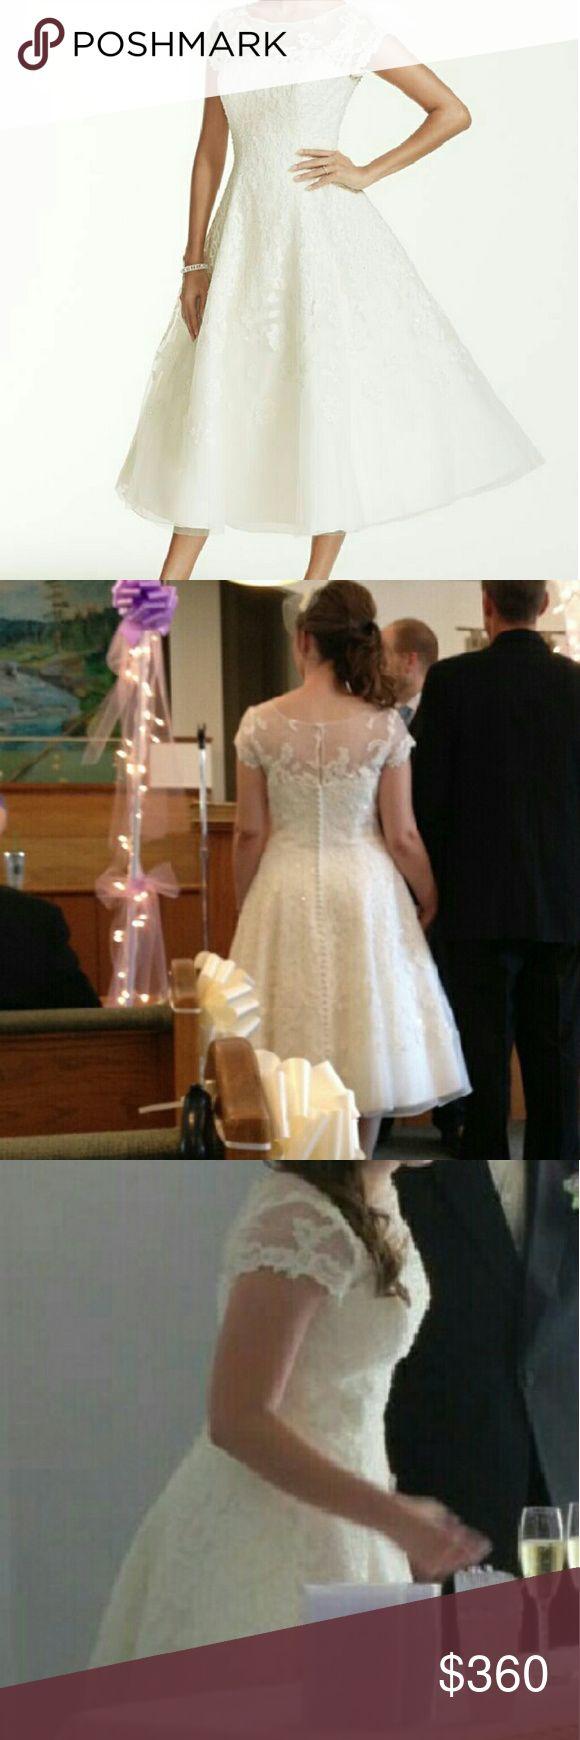 Enchanting Wedding Dress Steaming Cost Gift - Wedding Dress Ideas ...